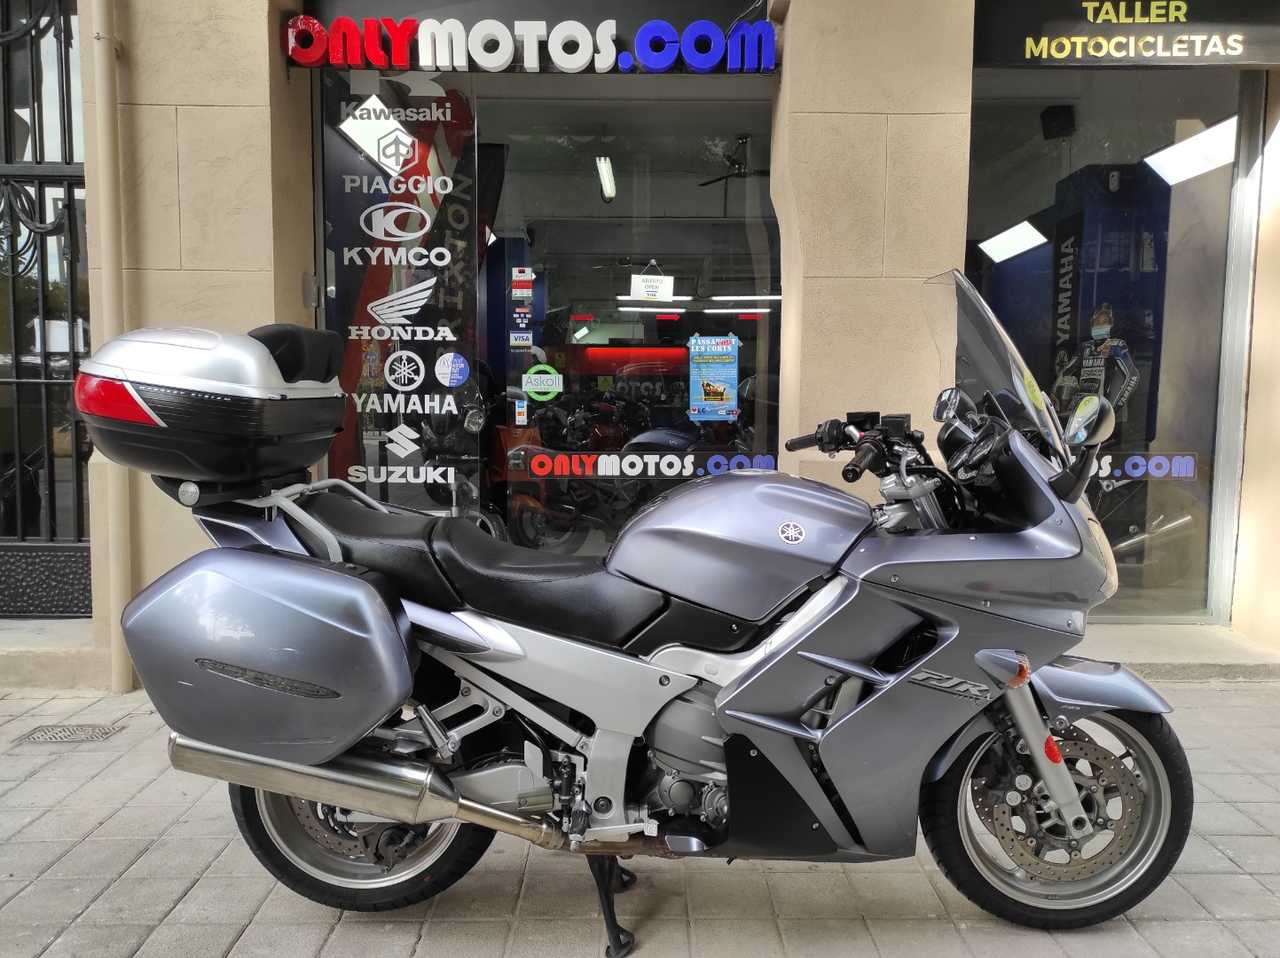 Yamaha FJR 1300   - Foto 1